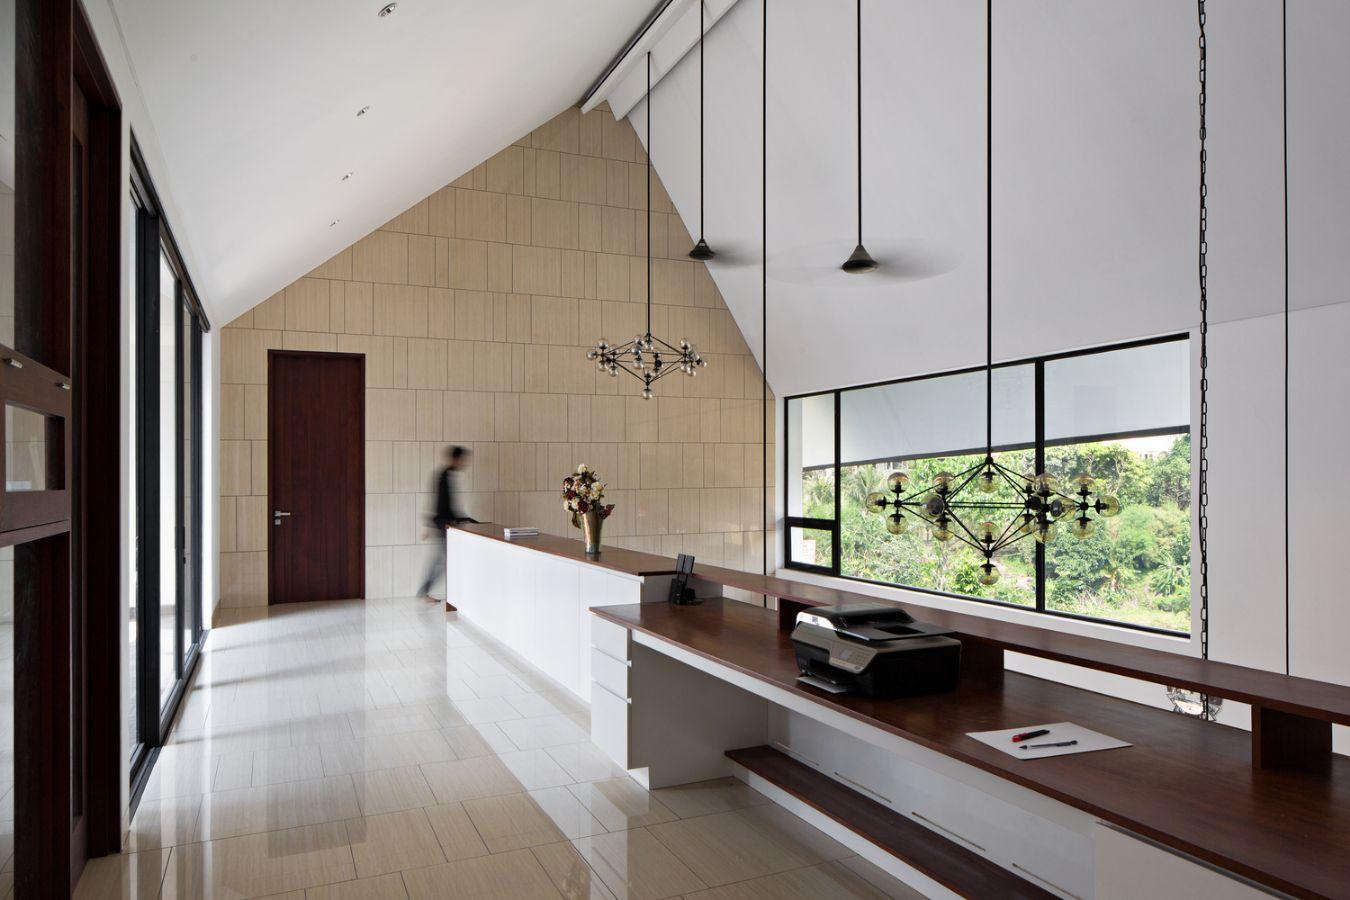 2_Casa de Montana_Studio Lawang_Inspirationist